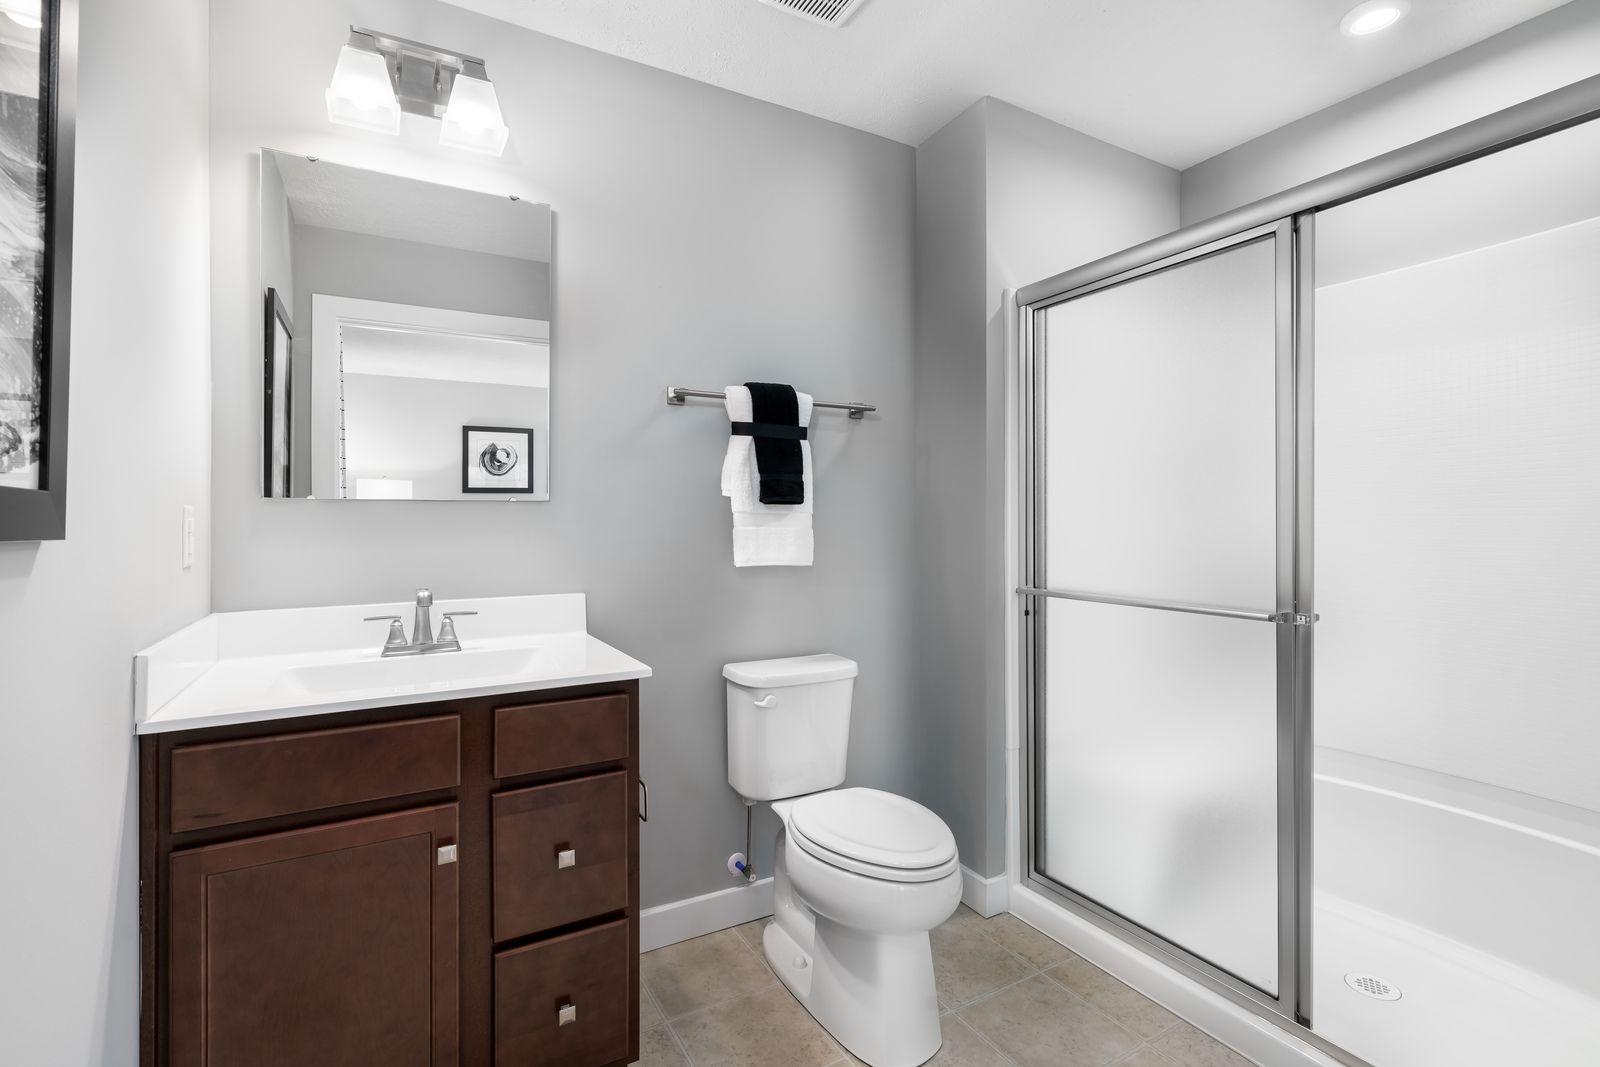 Bathroom featured in the Aruba Bay By Ryan Homes in Philadelphia, NJ